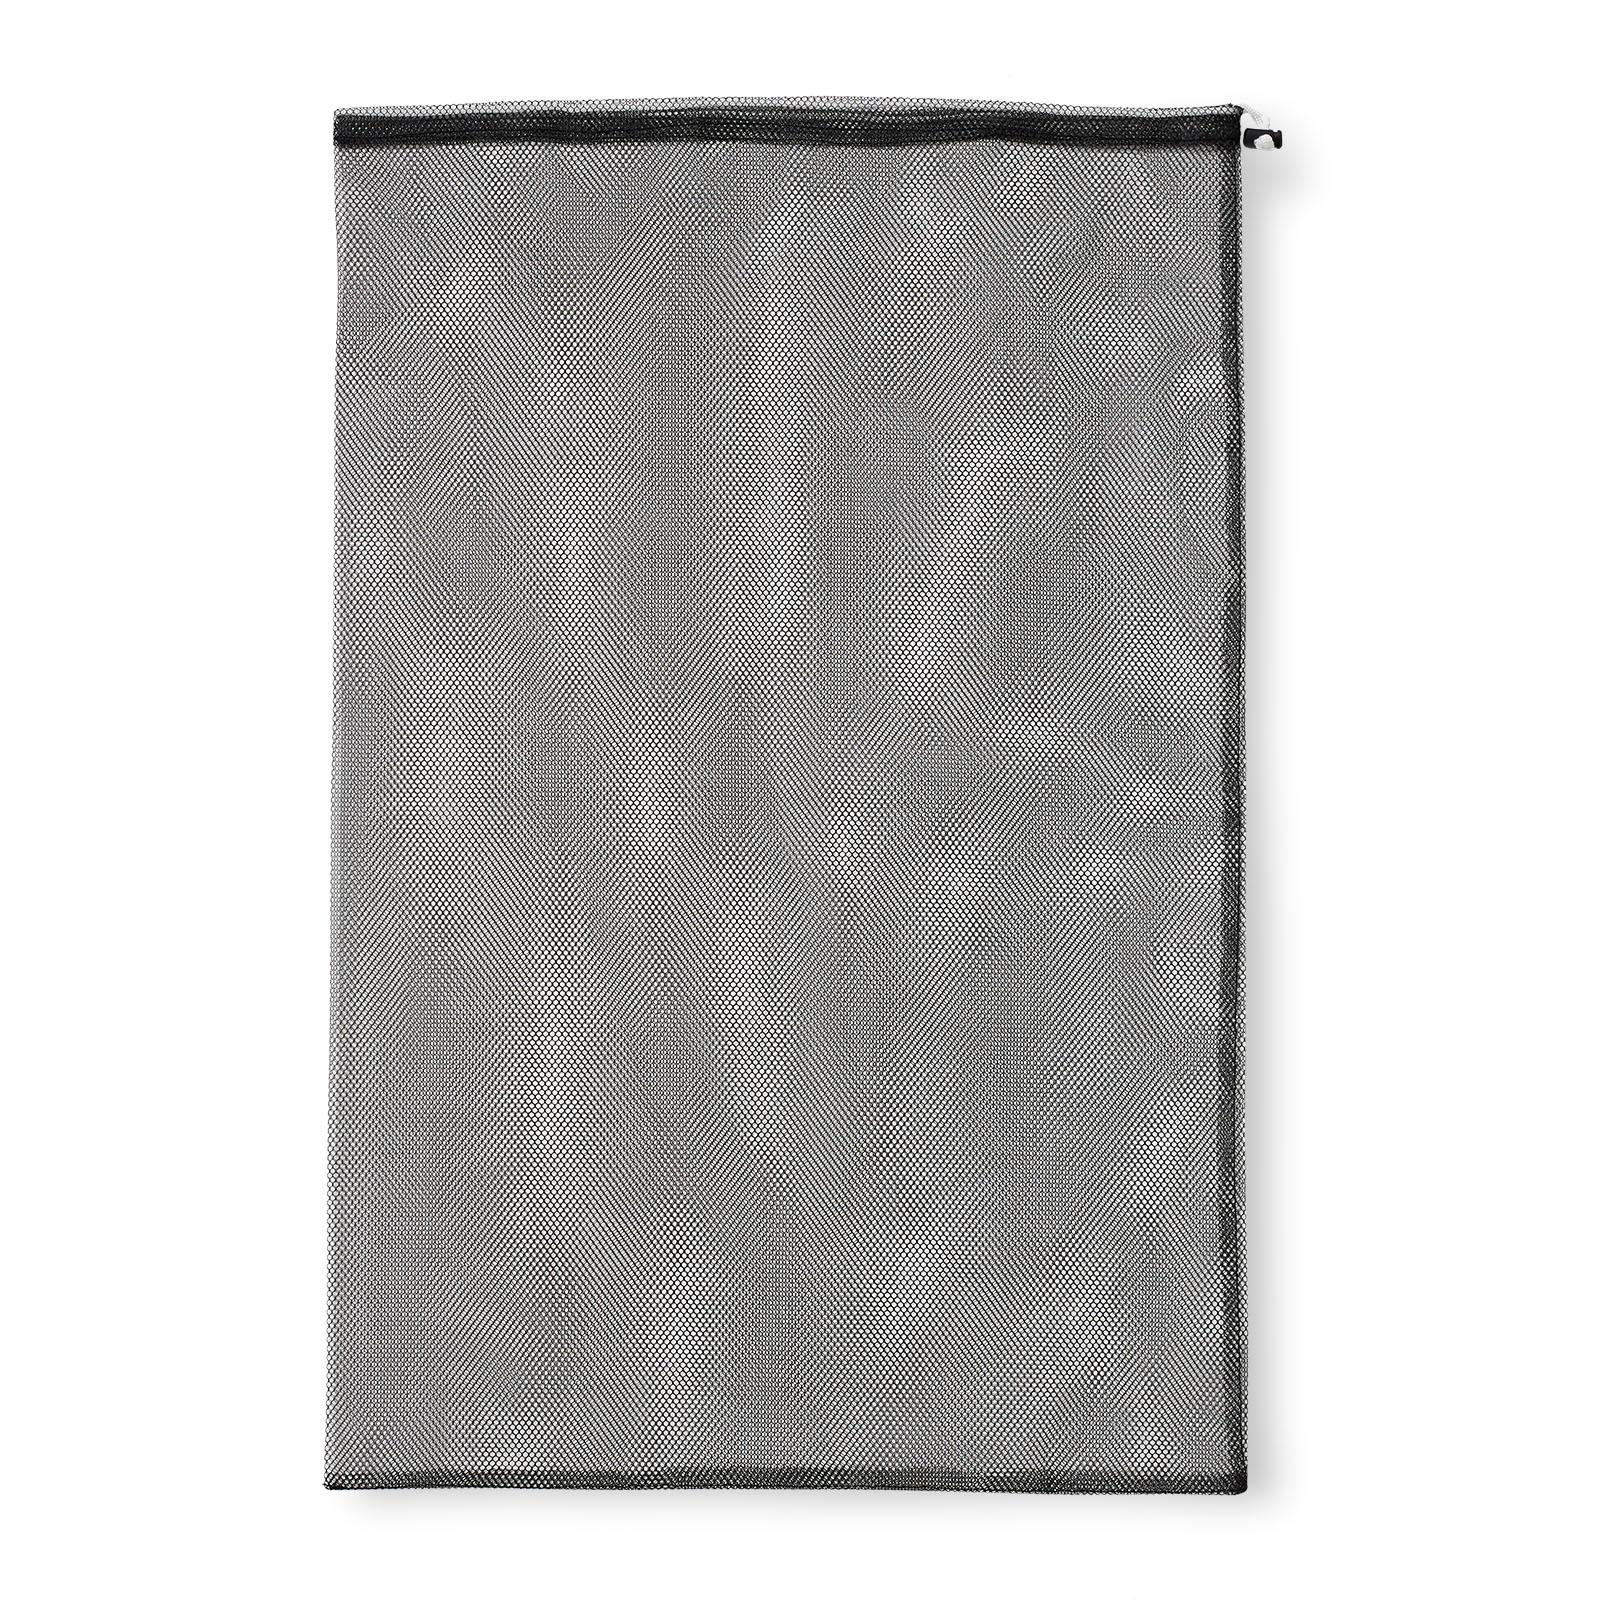 24-034-x-36-034-Large-Heavy-Duty-Mesh-Net-Drawstring-Laundry-or-Equipment-Ball-Bag thumbnail 3